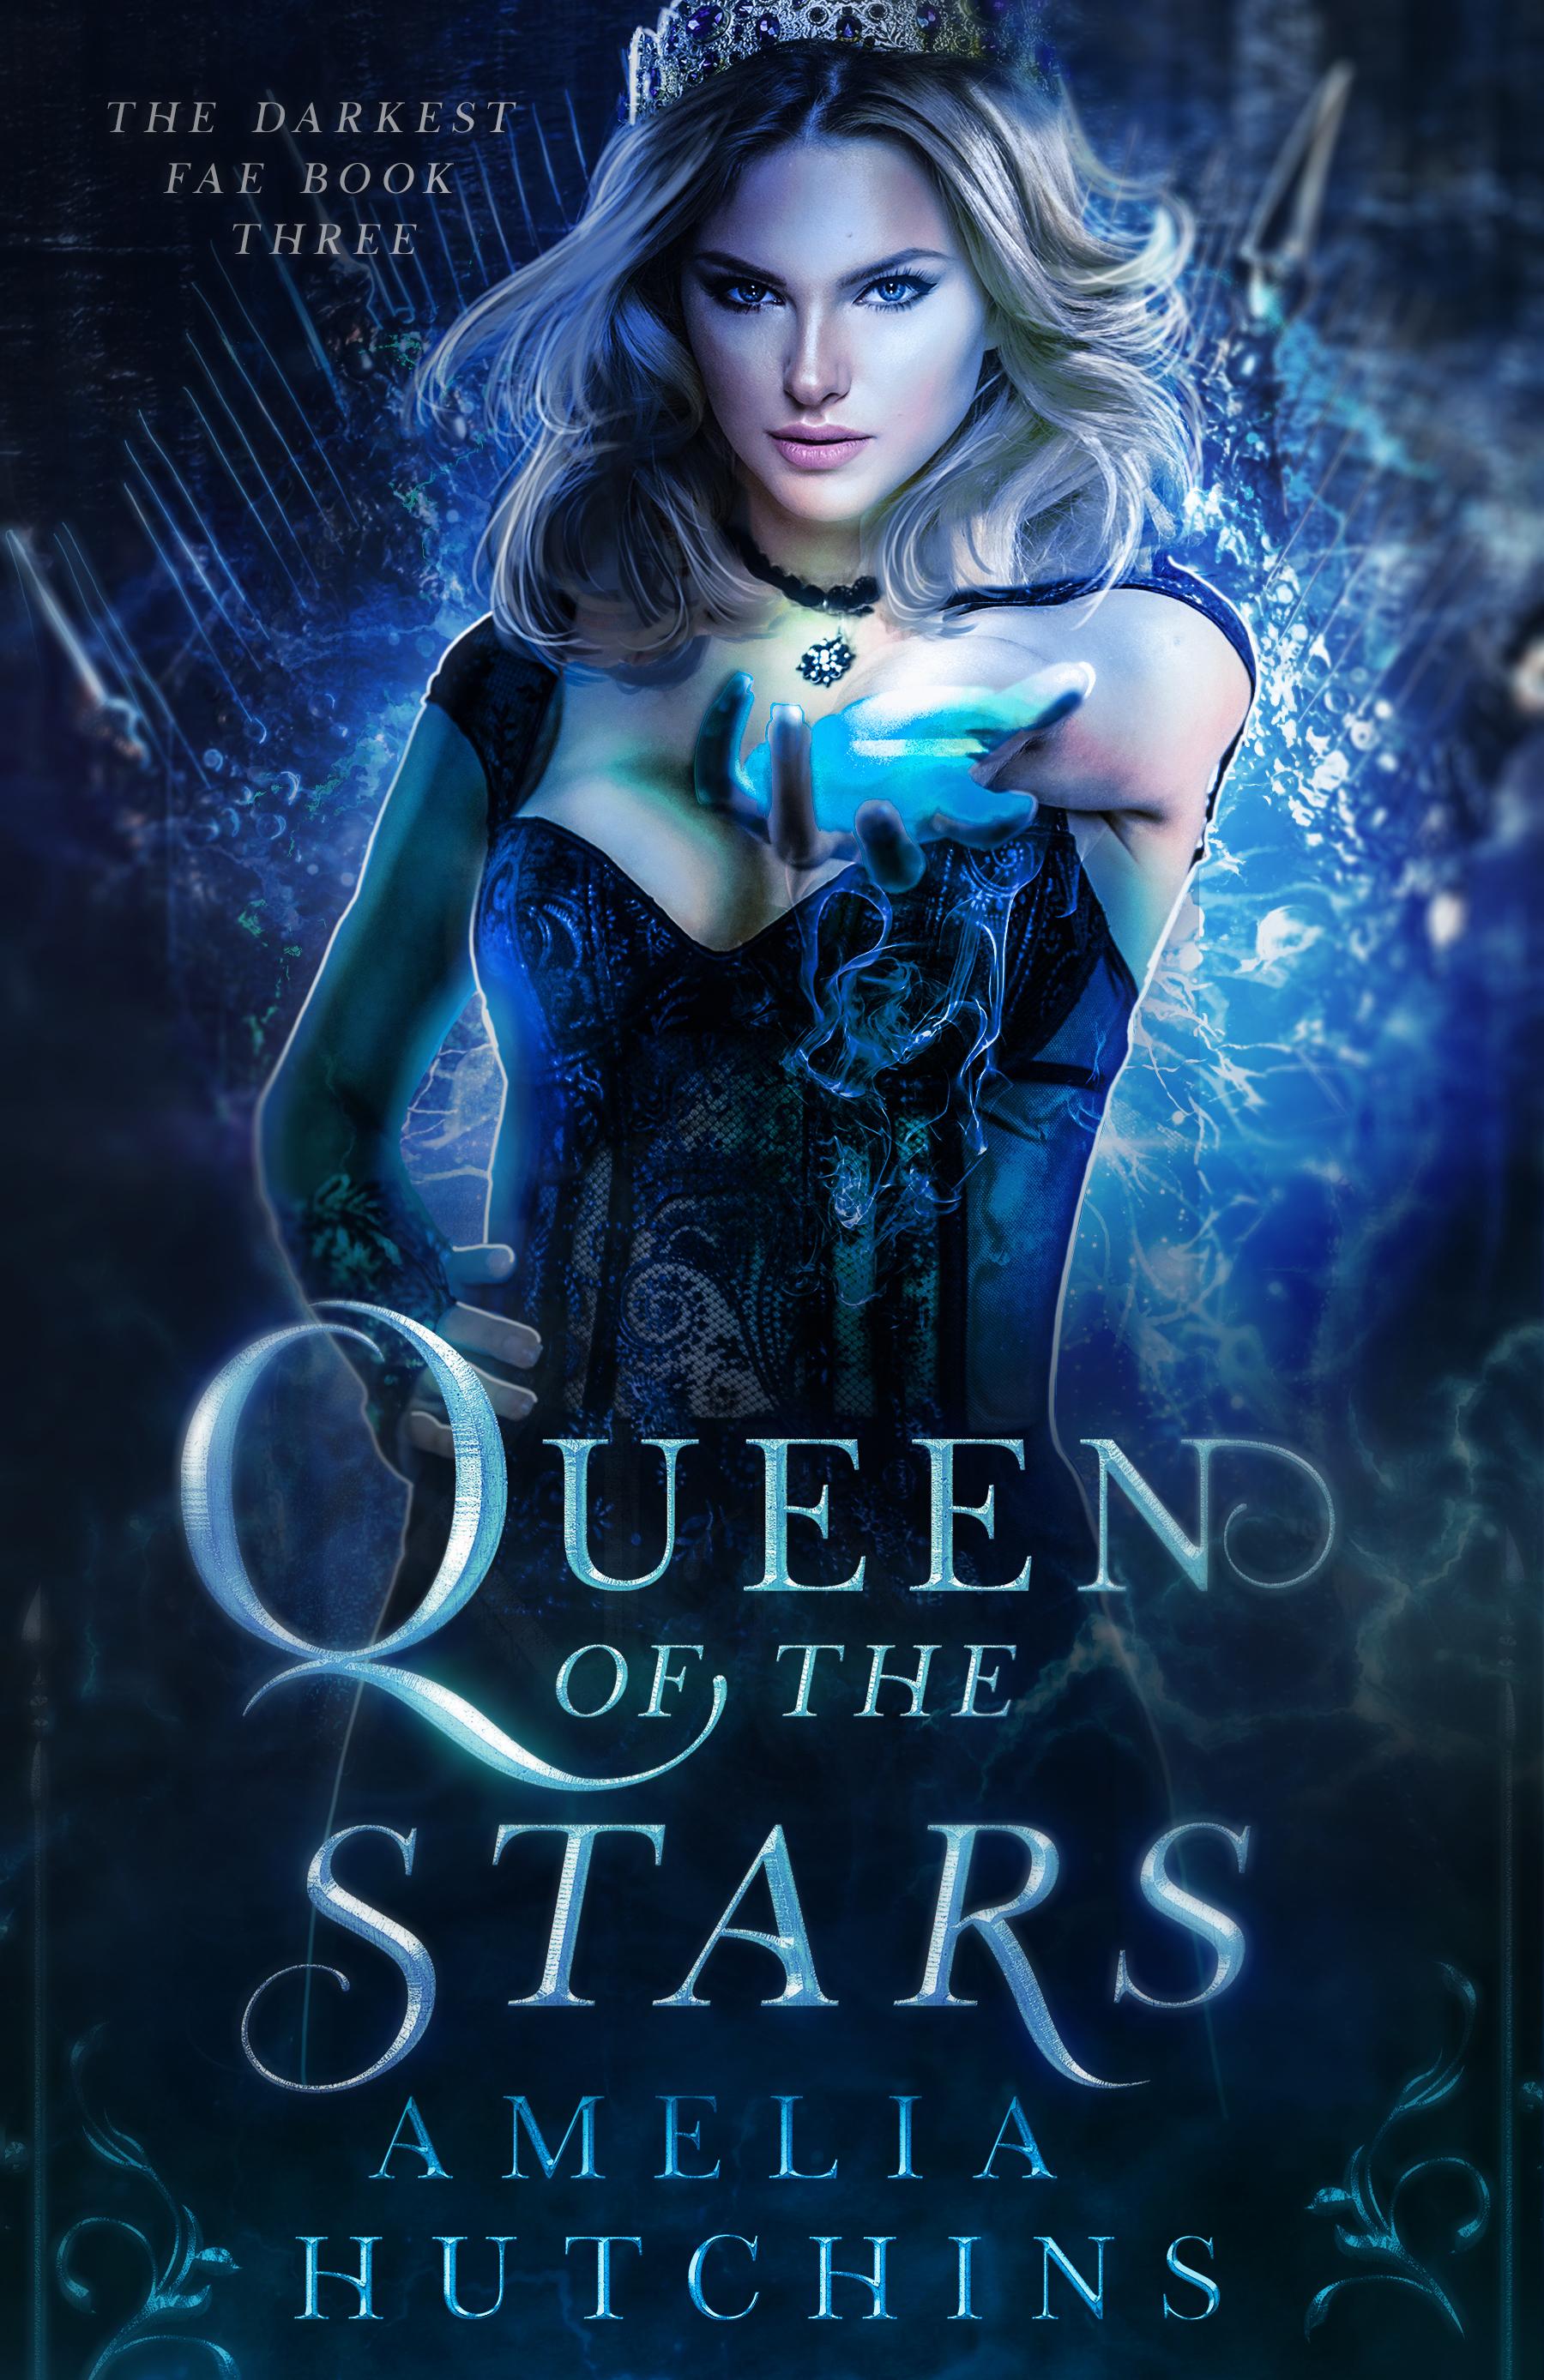 QueenoftheStars_1